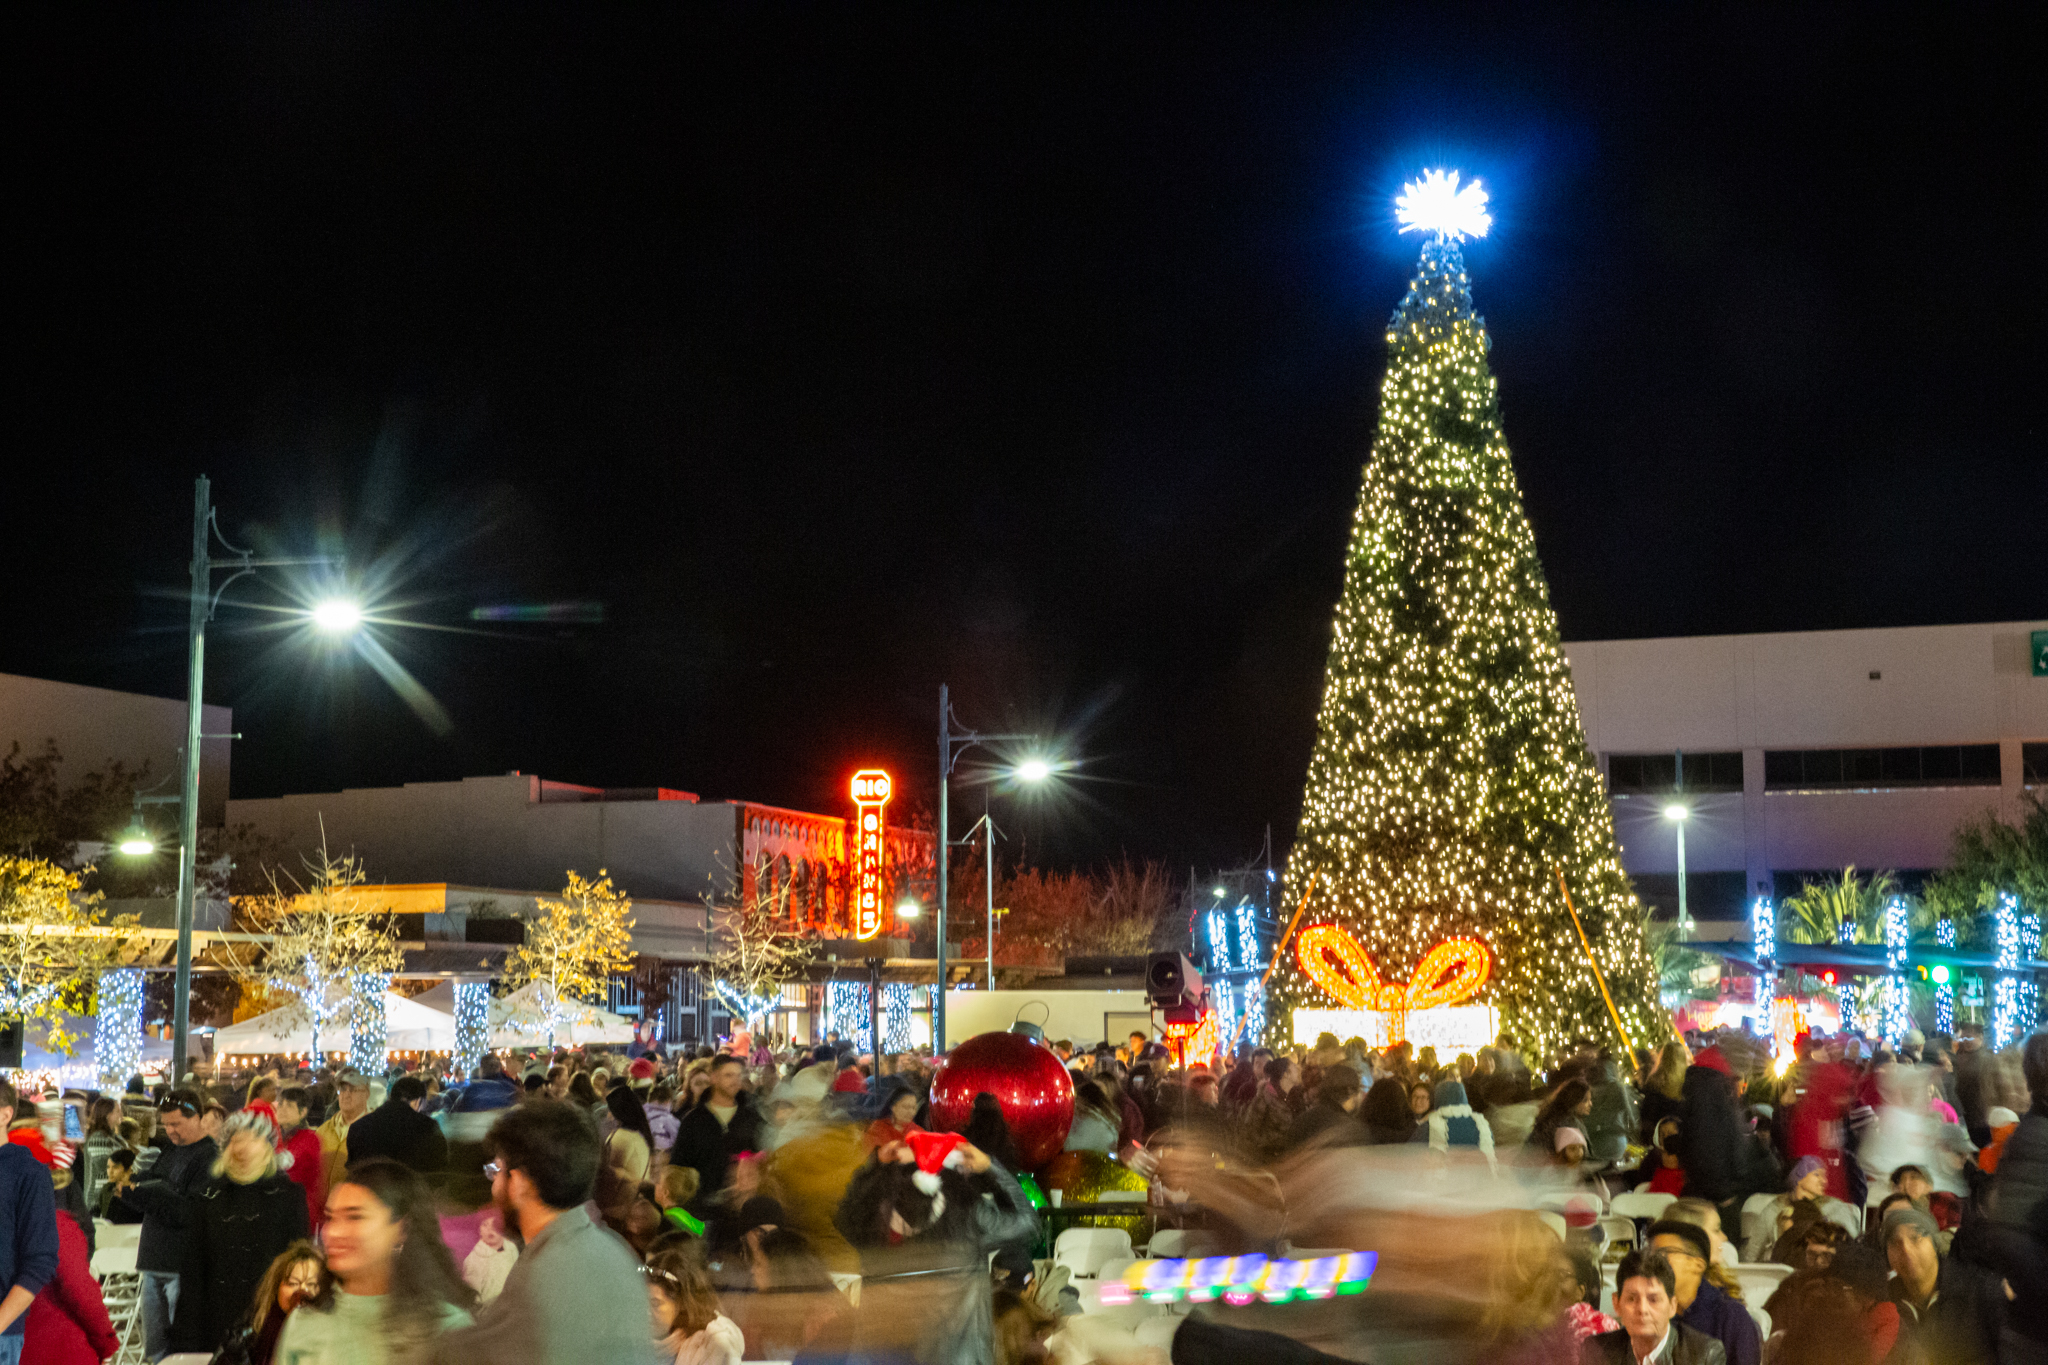 Mesilla Christmas Tree Lighting 2020 Las Cruces prepares for annual Christmas Tree Lighting Ceremony